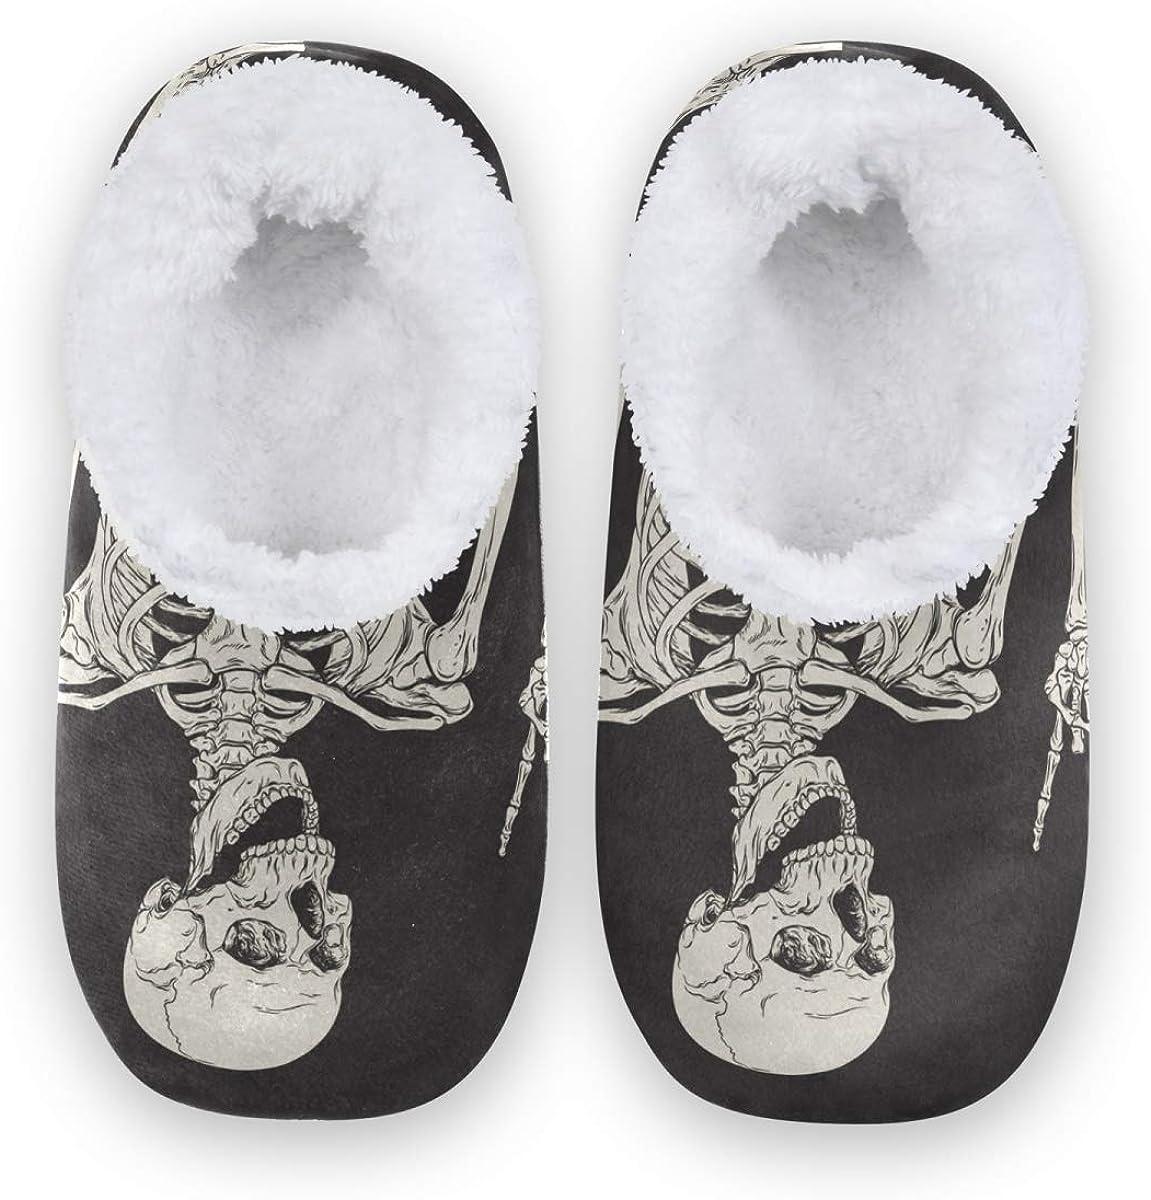 Qmxo Funny Human Skull Black Slippers for Women and Men, Womens Coral Fleece Indoor Slippers House Slippers Socks Fuzzy Feet Slippers Bedroom Slippers Non-Slip